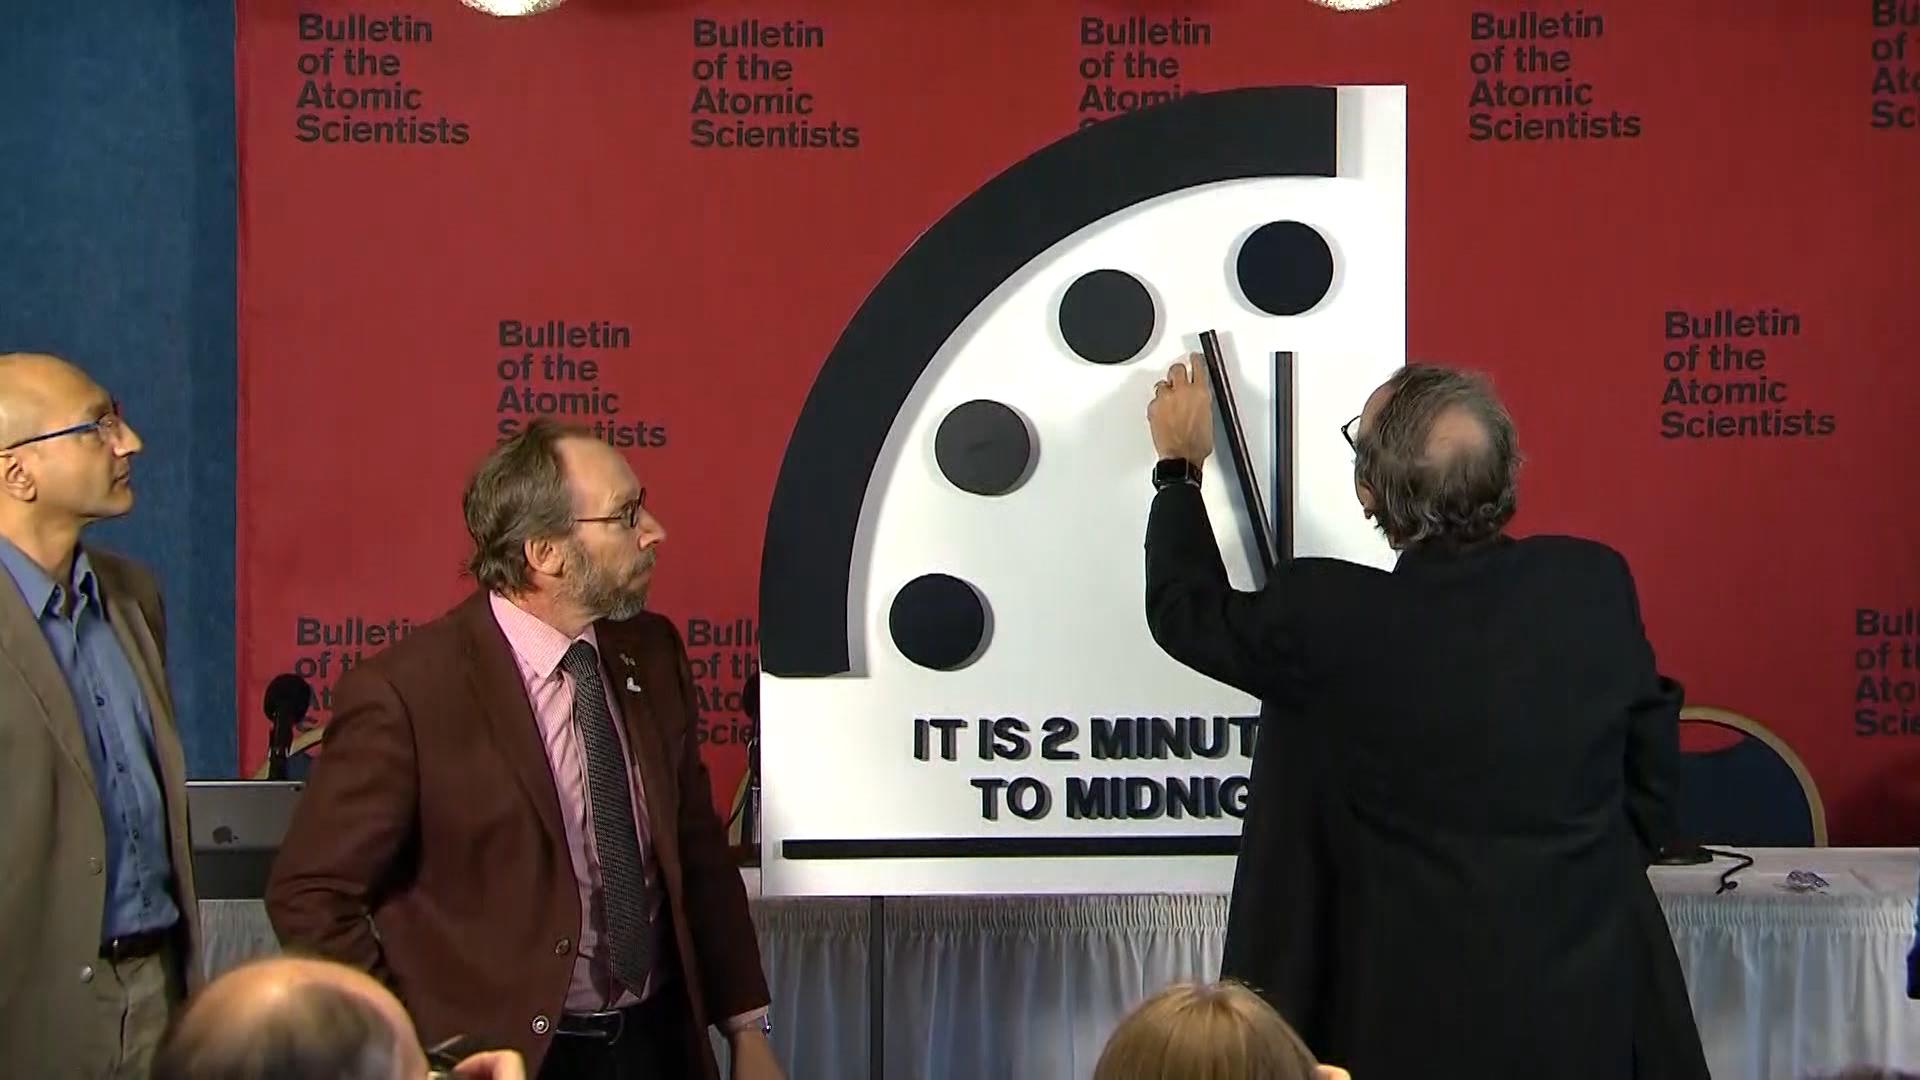 Doomsday Clock set at 2 minutes to midnight